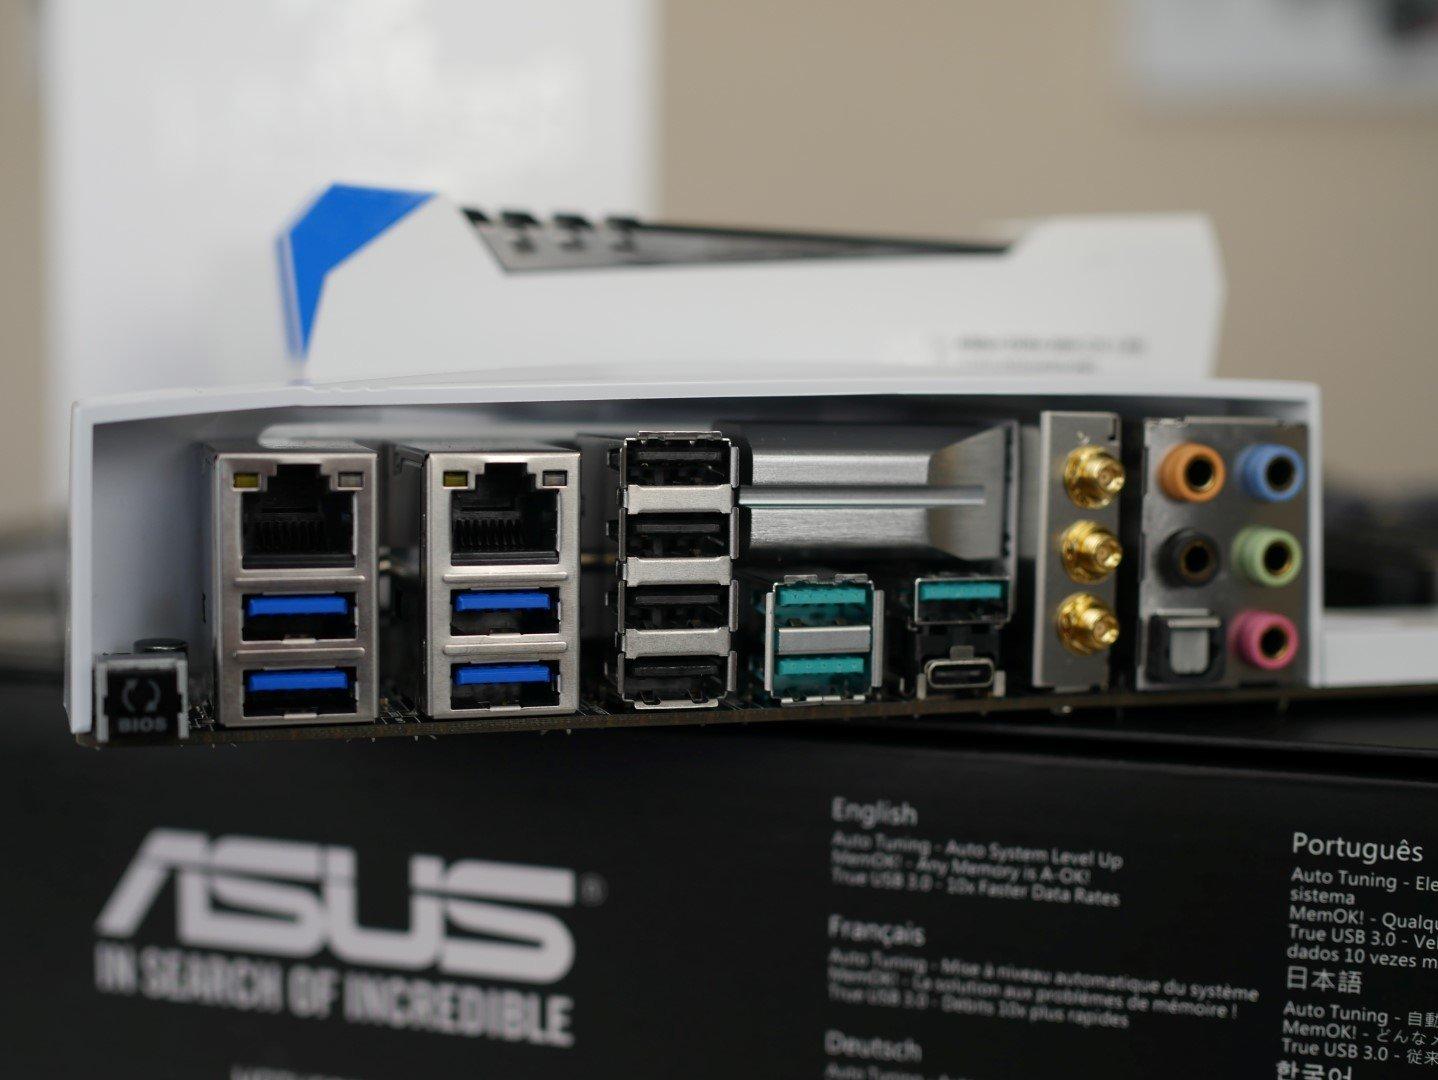 Asus X99-Deluxe II: Blick auf das I/O-Panel